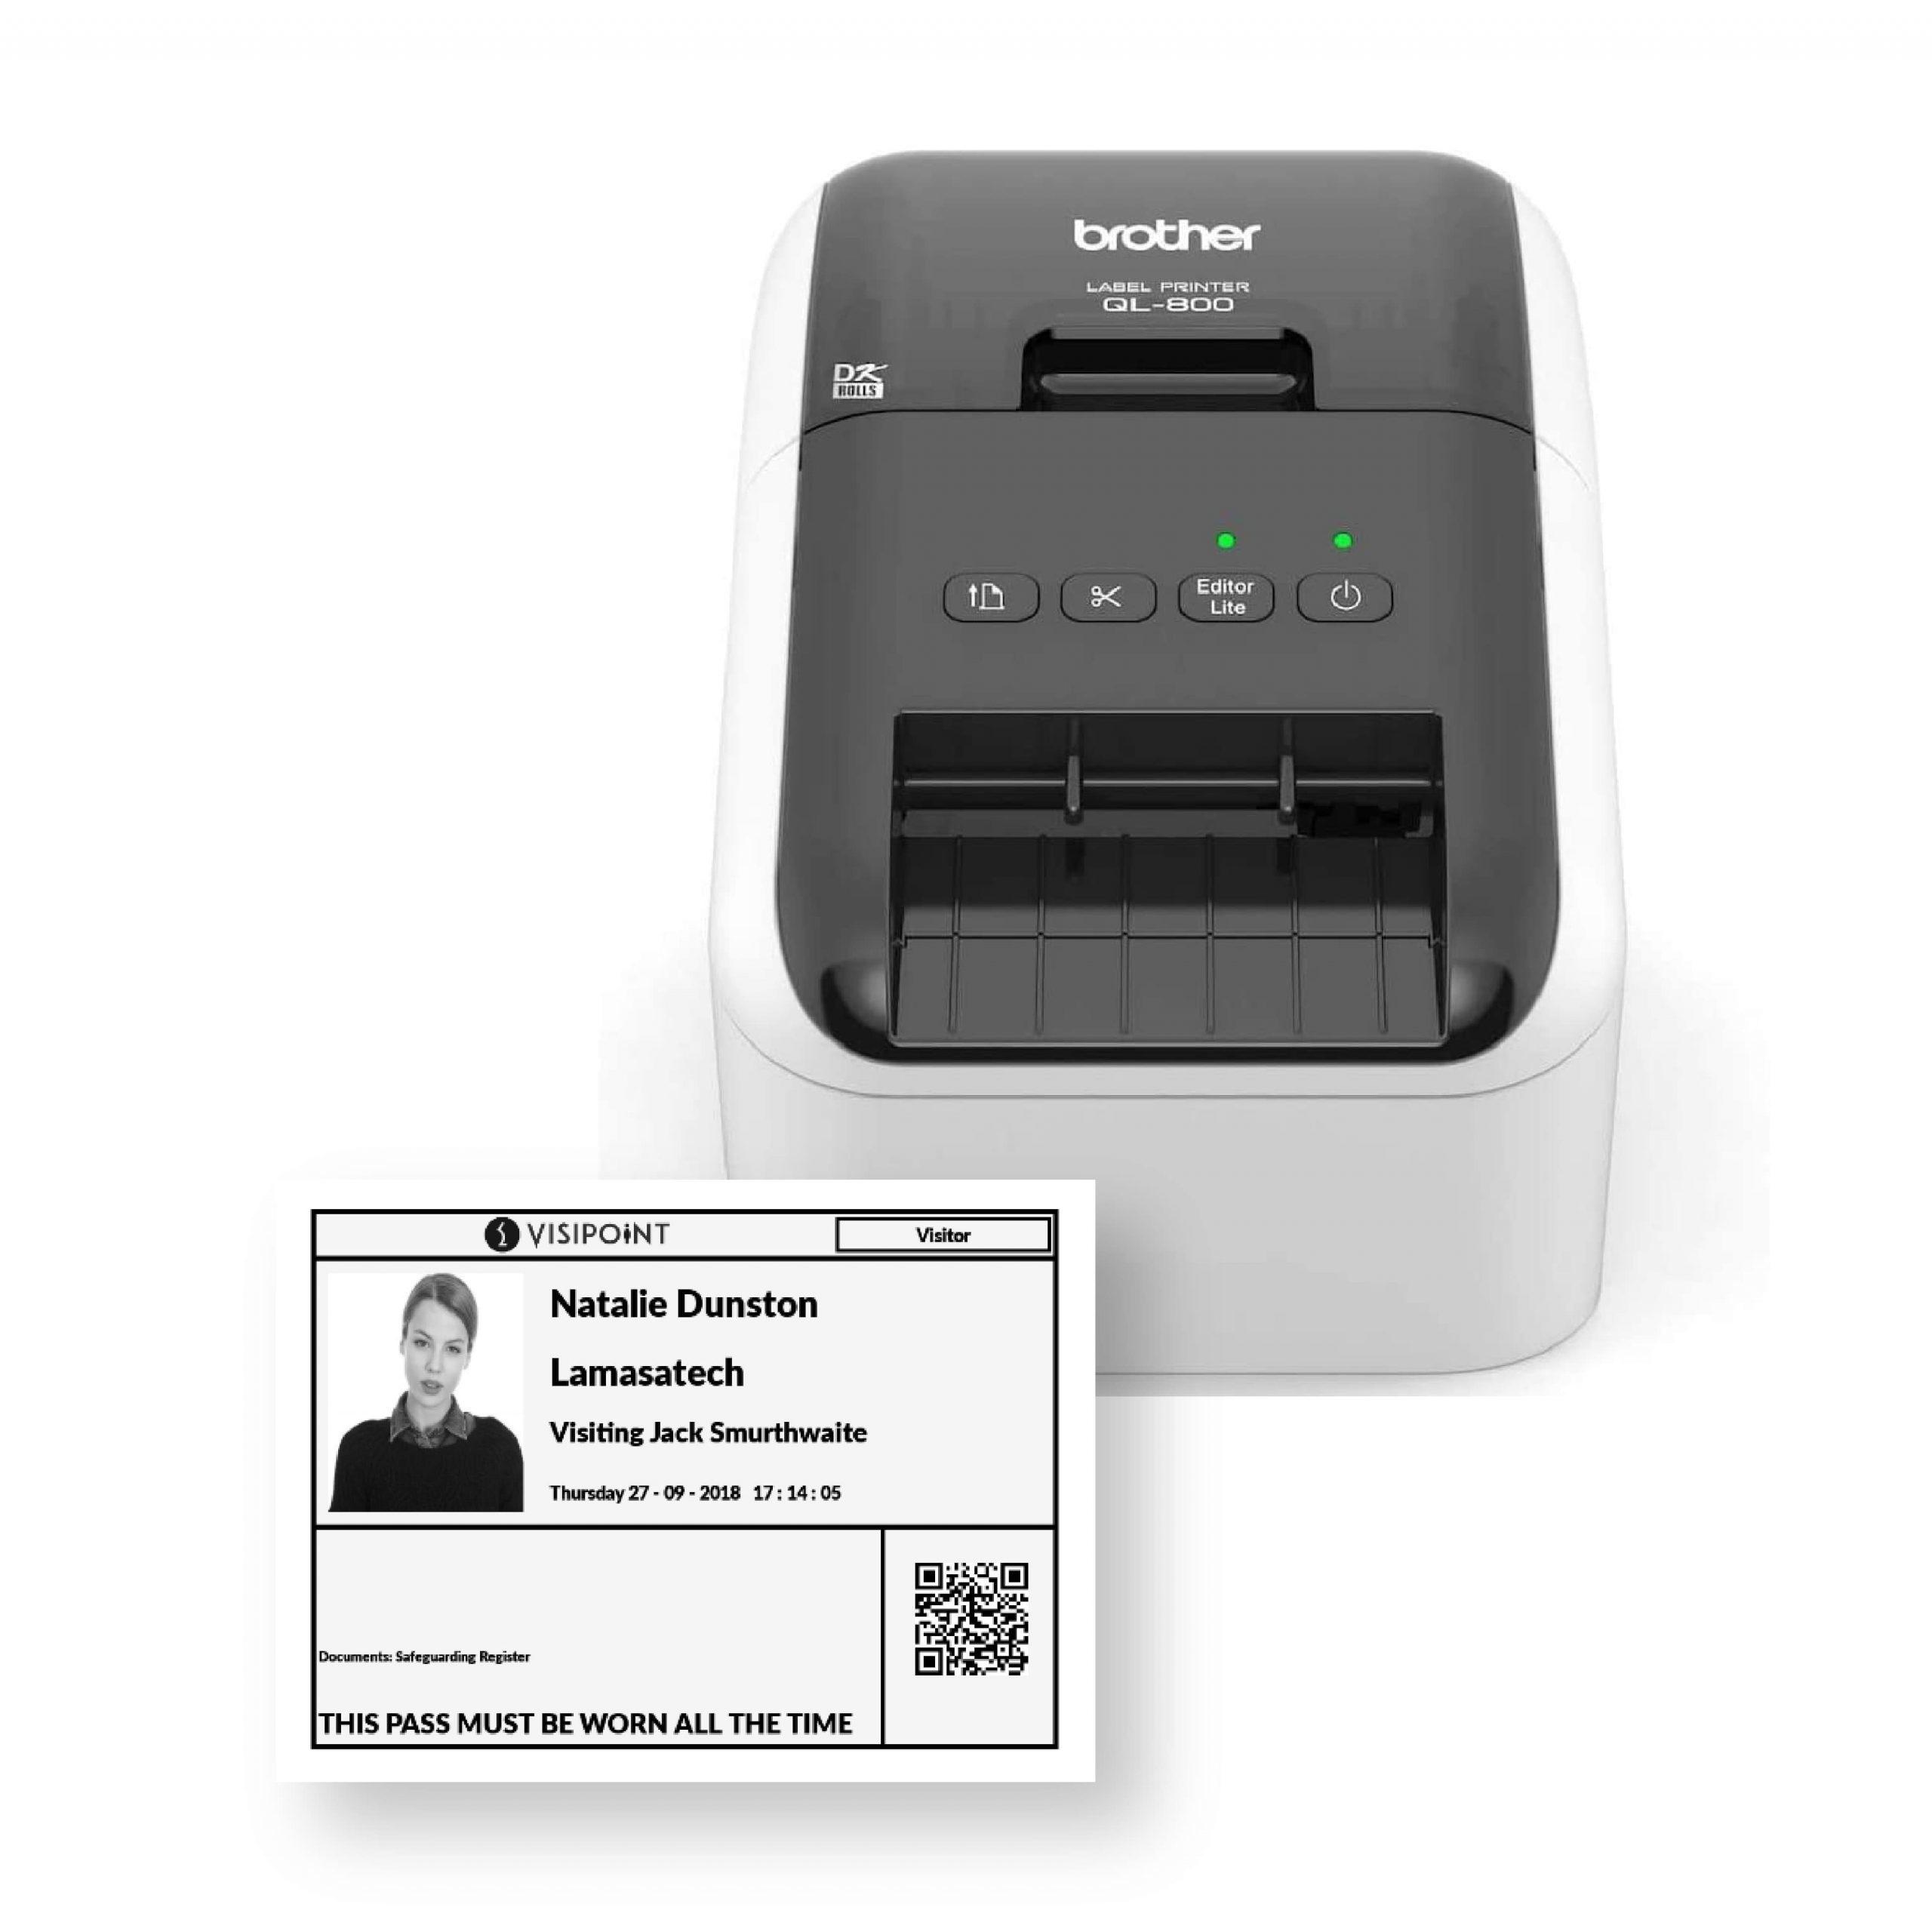 ID Badges Visitor Management System